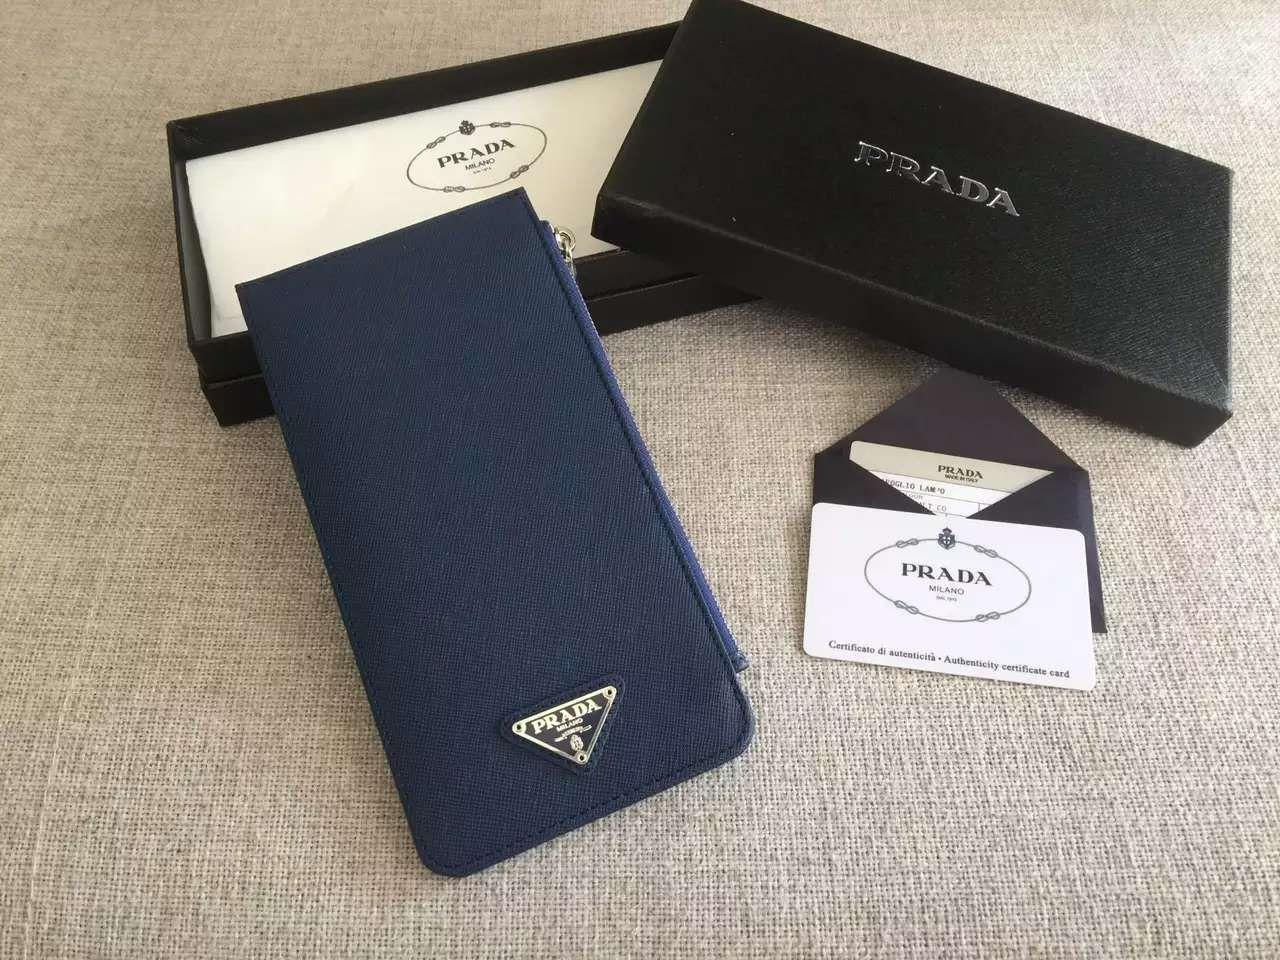 Prada Backpack For Sale